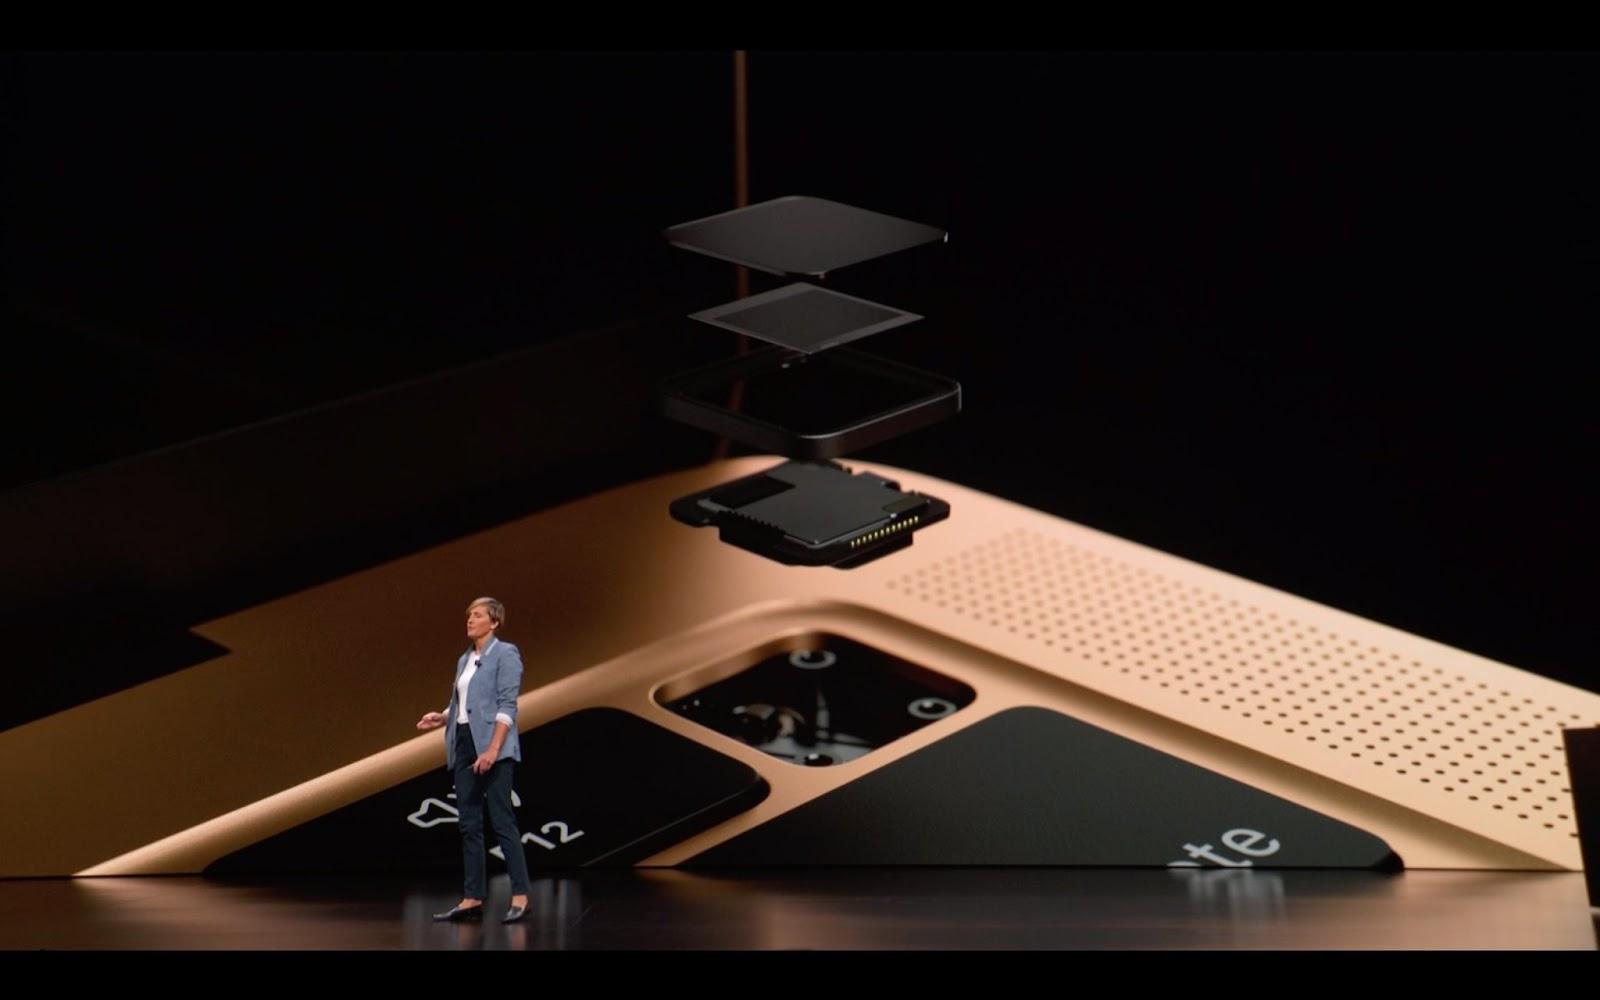 Đang tải Macbook_Air_2018_tinhte-5.jpg…